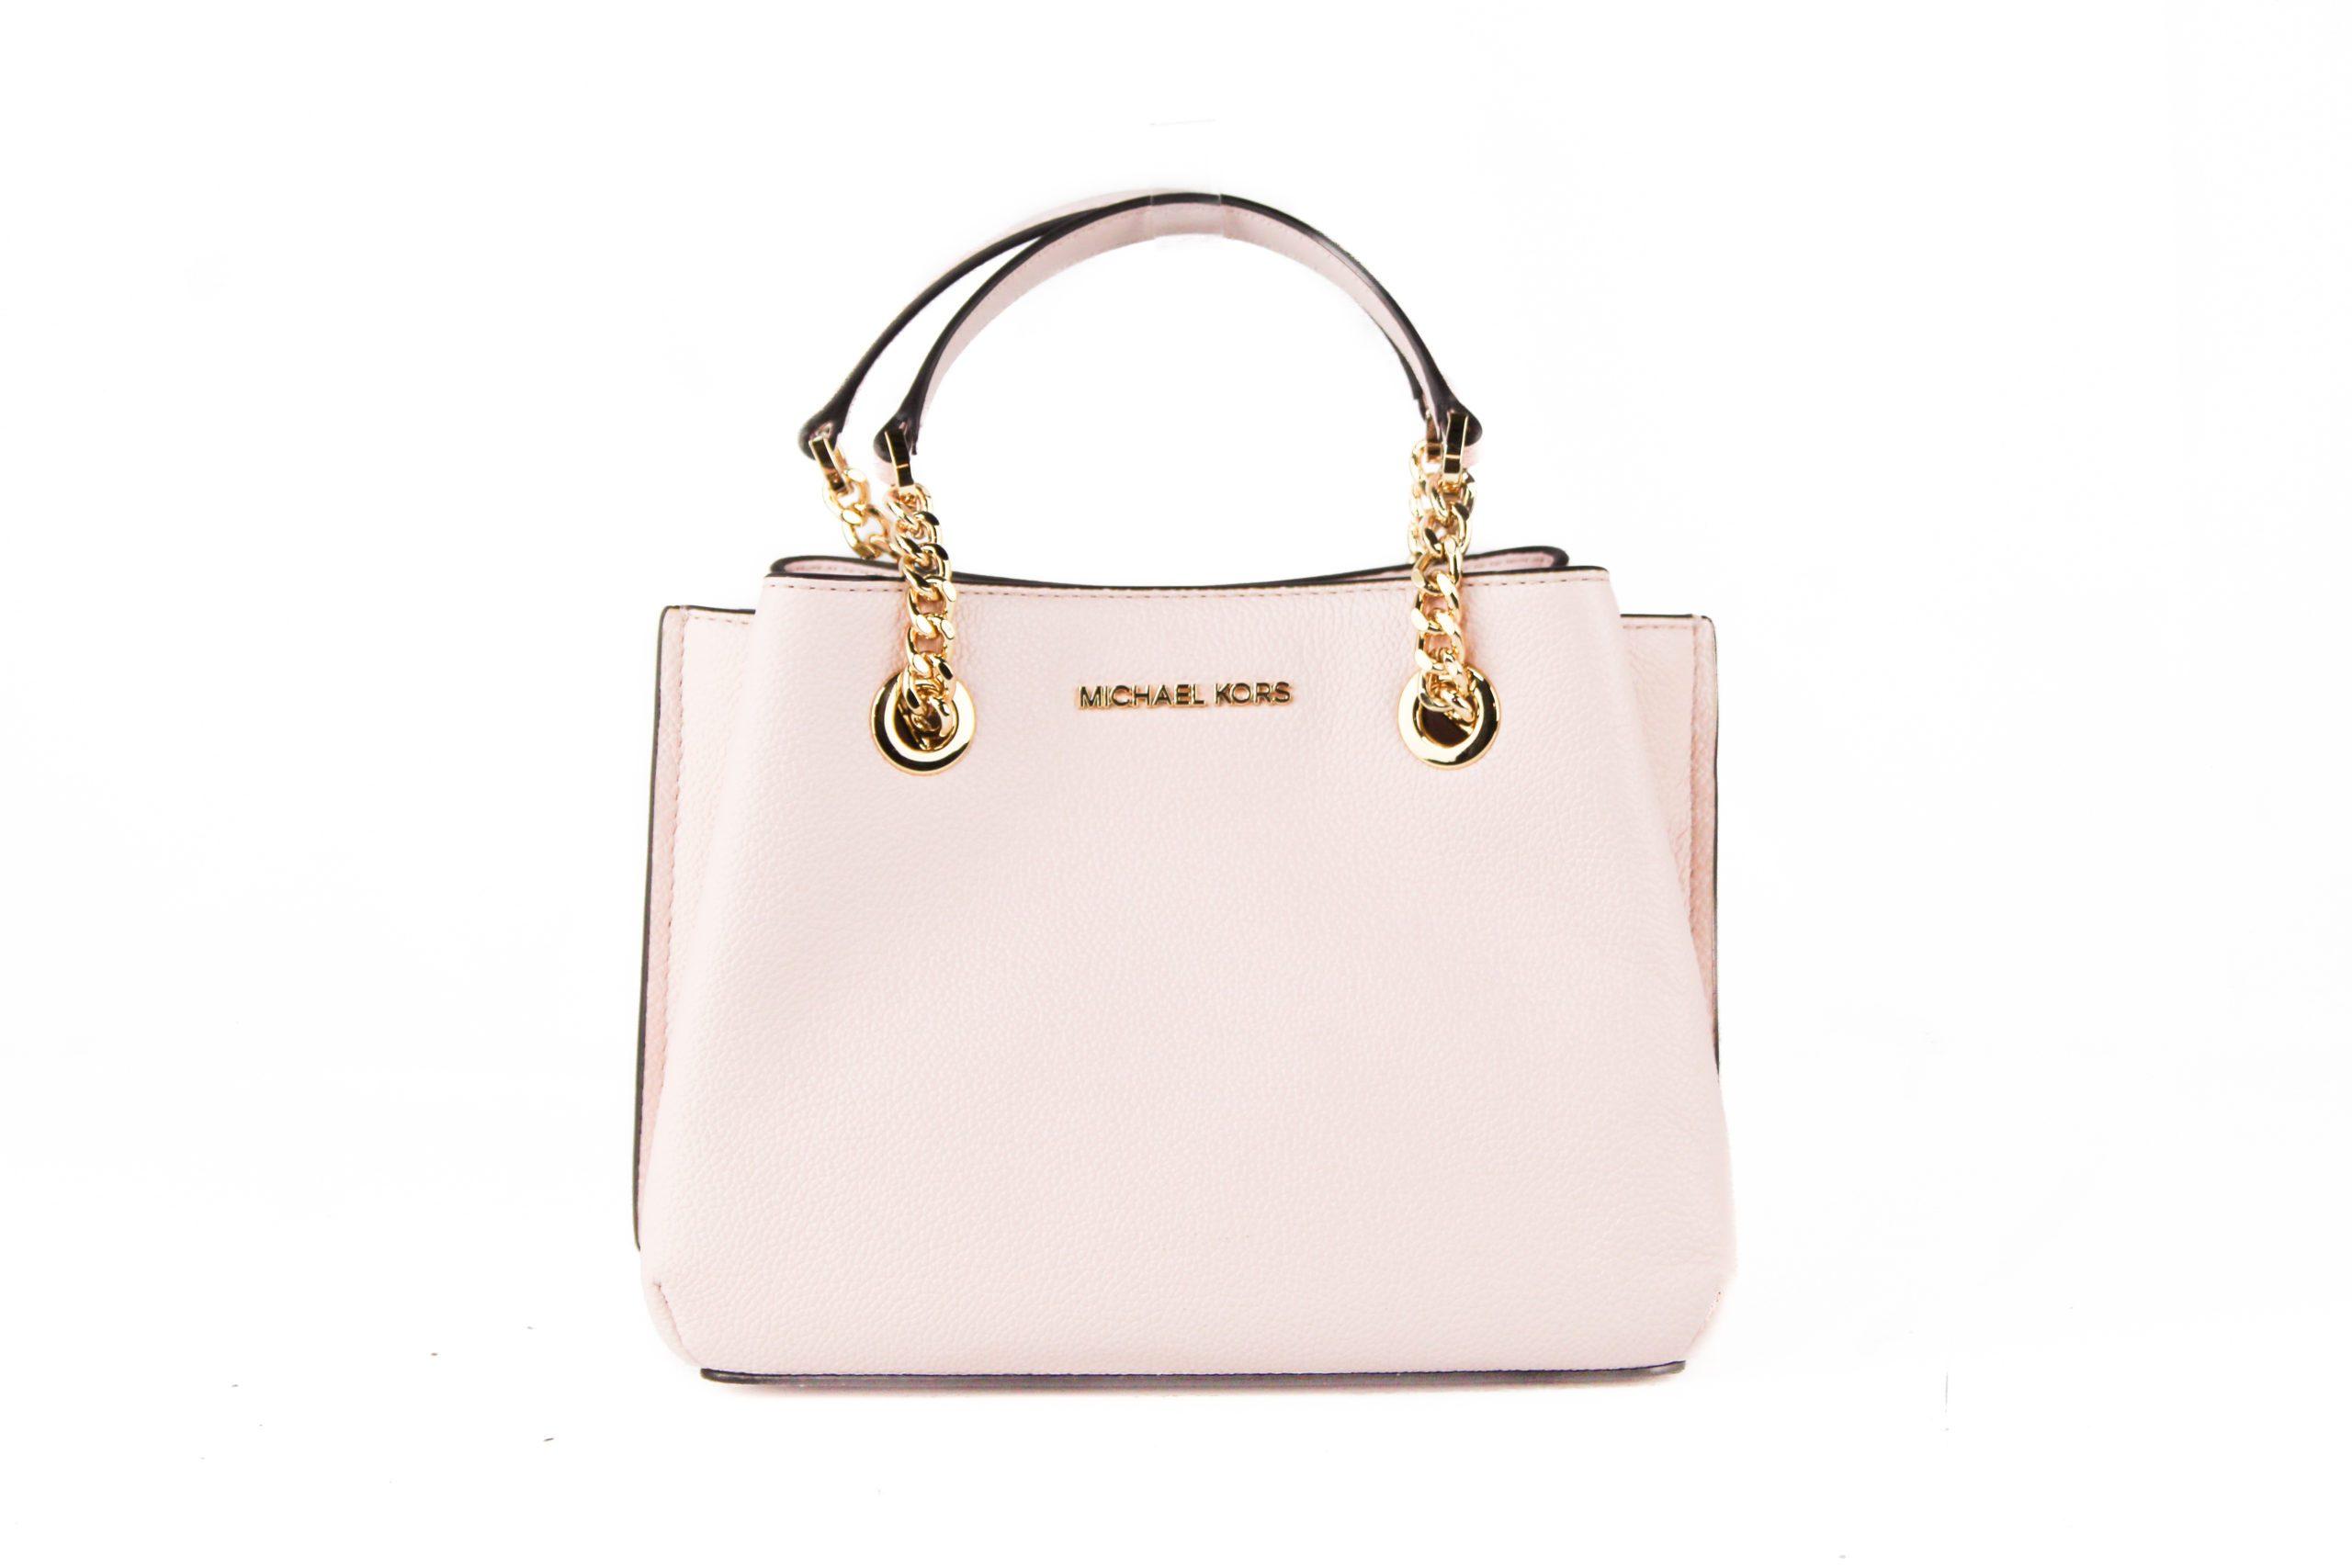 Michael Kors Women's Teagen Signature Leather Small Shoulder Bag Pink 709758